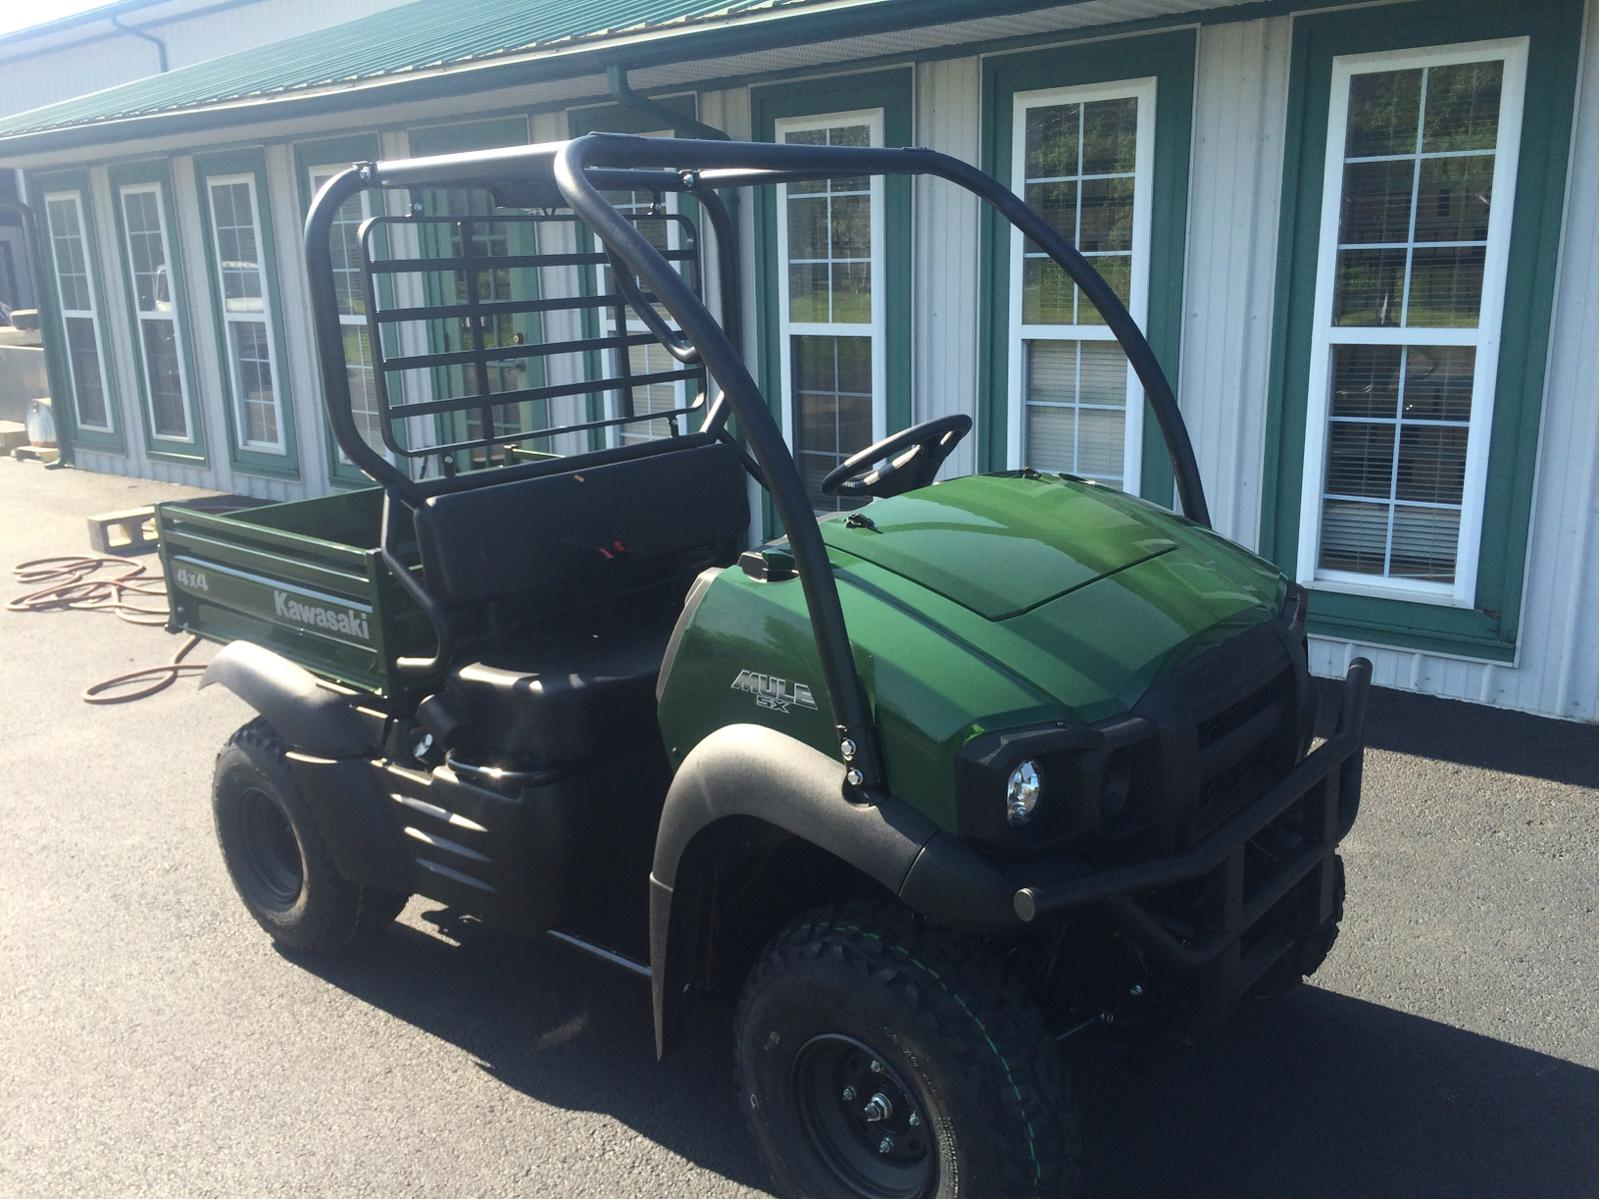 2017 kawasaki mule sx 4x4 green for sale in herrin, il | good guys